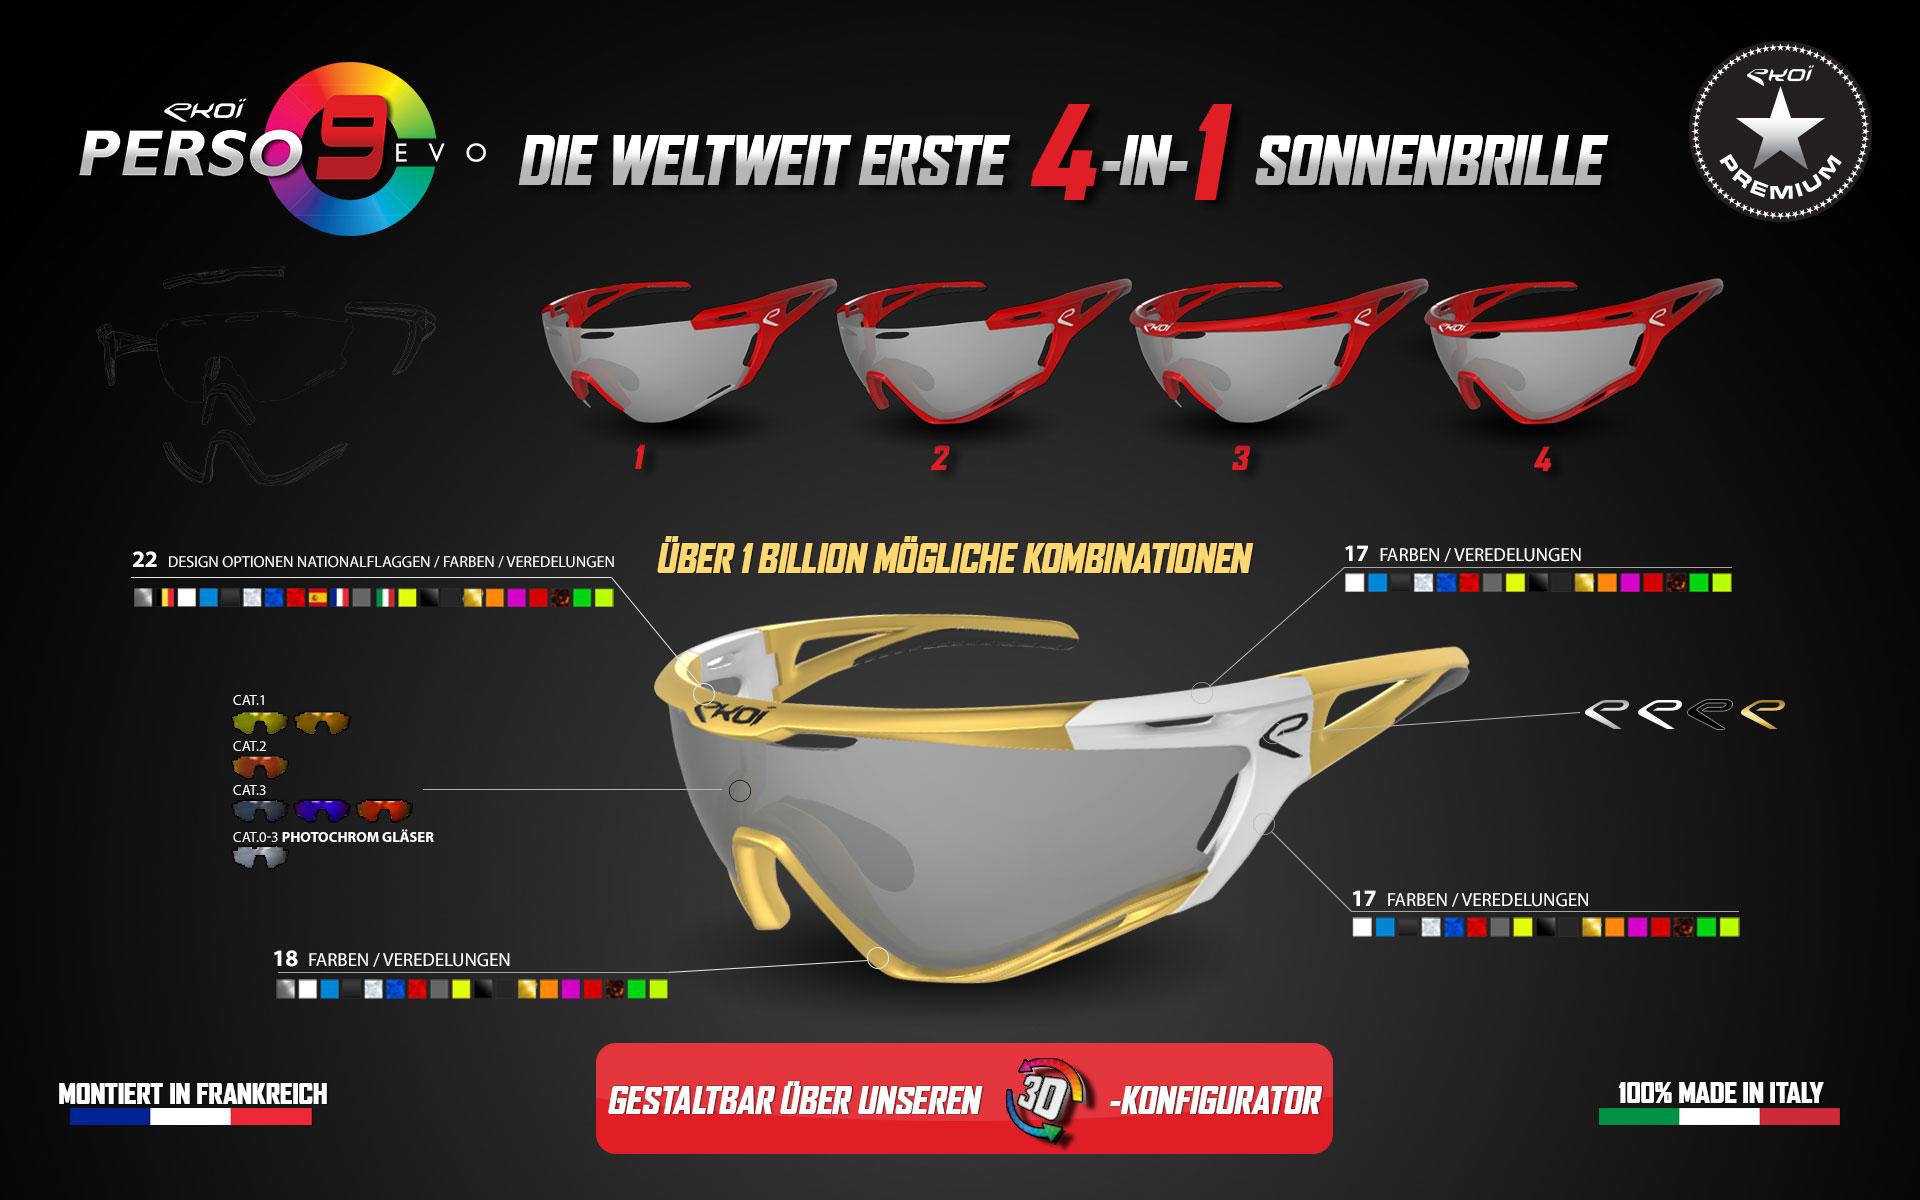 Nouvelle lunettes Persoevo9 EKOI personnalisable